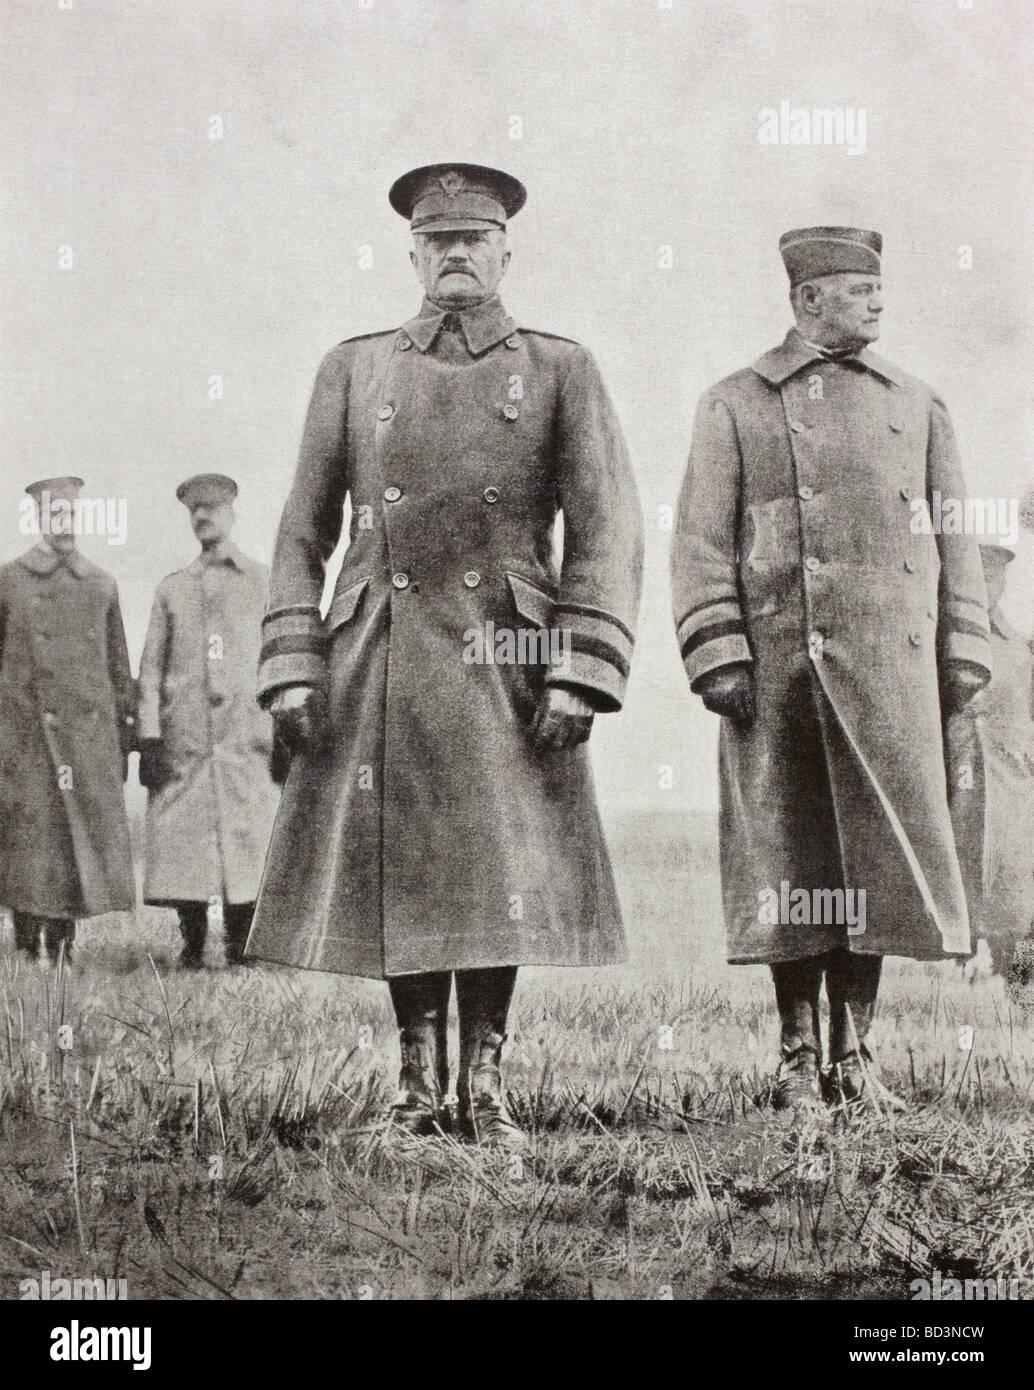 American First World War Generals, John Joseph Black Jack Pershing centre and Hunter Ligget right. - Stock Image